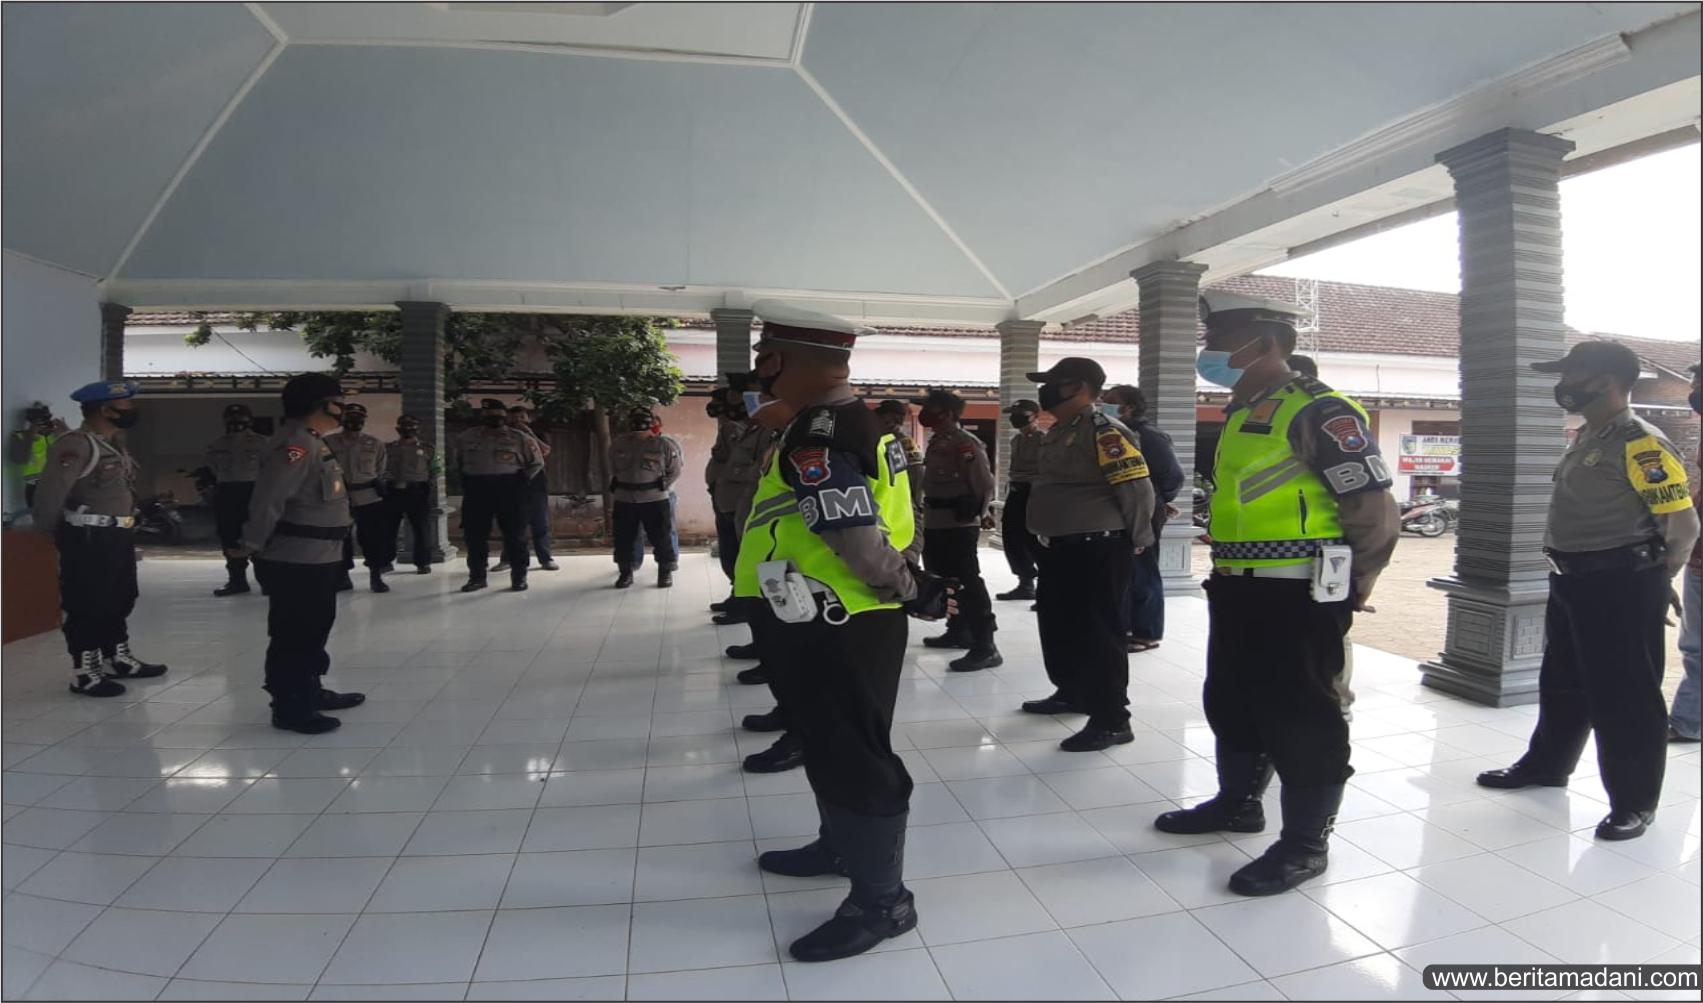 Polresta Kediri Kota Lakukan Pengamanan Kampanye Calon Bupati dan Wakil Bupati Kediri Dhito-Dewi